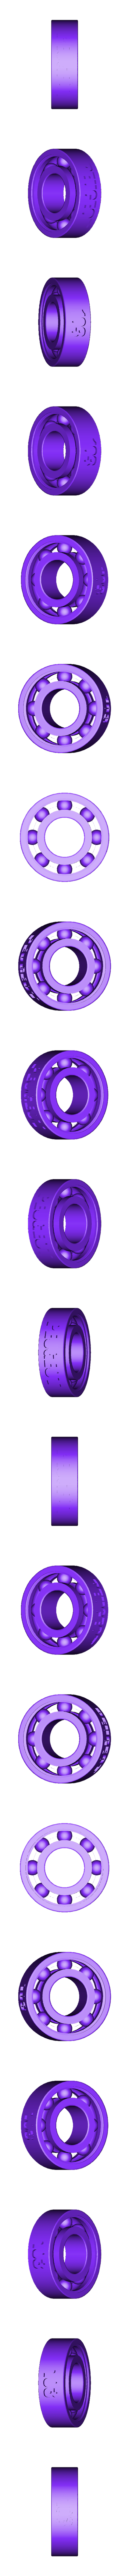 103 BILLE 2.stl Download free STL file False Peugeot 103 bearing • 3D printing template, Ours3DPrinting